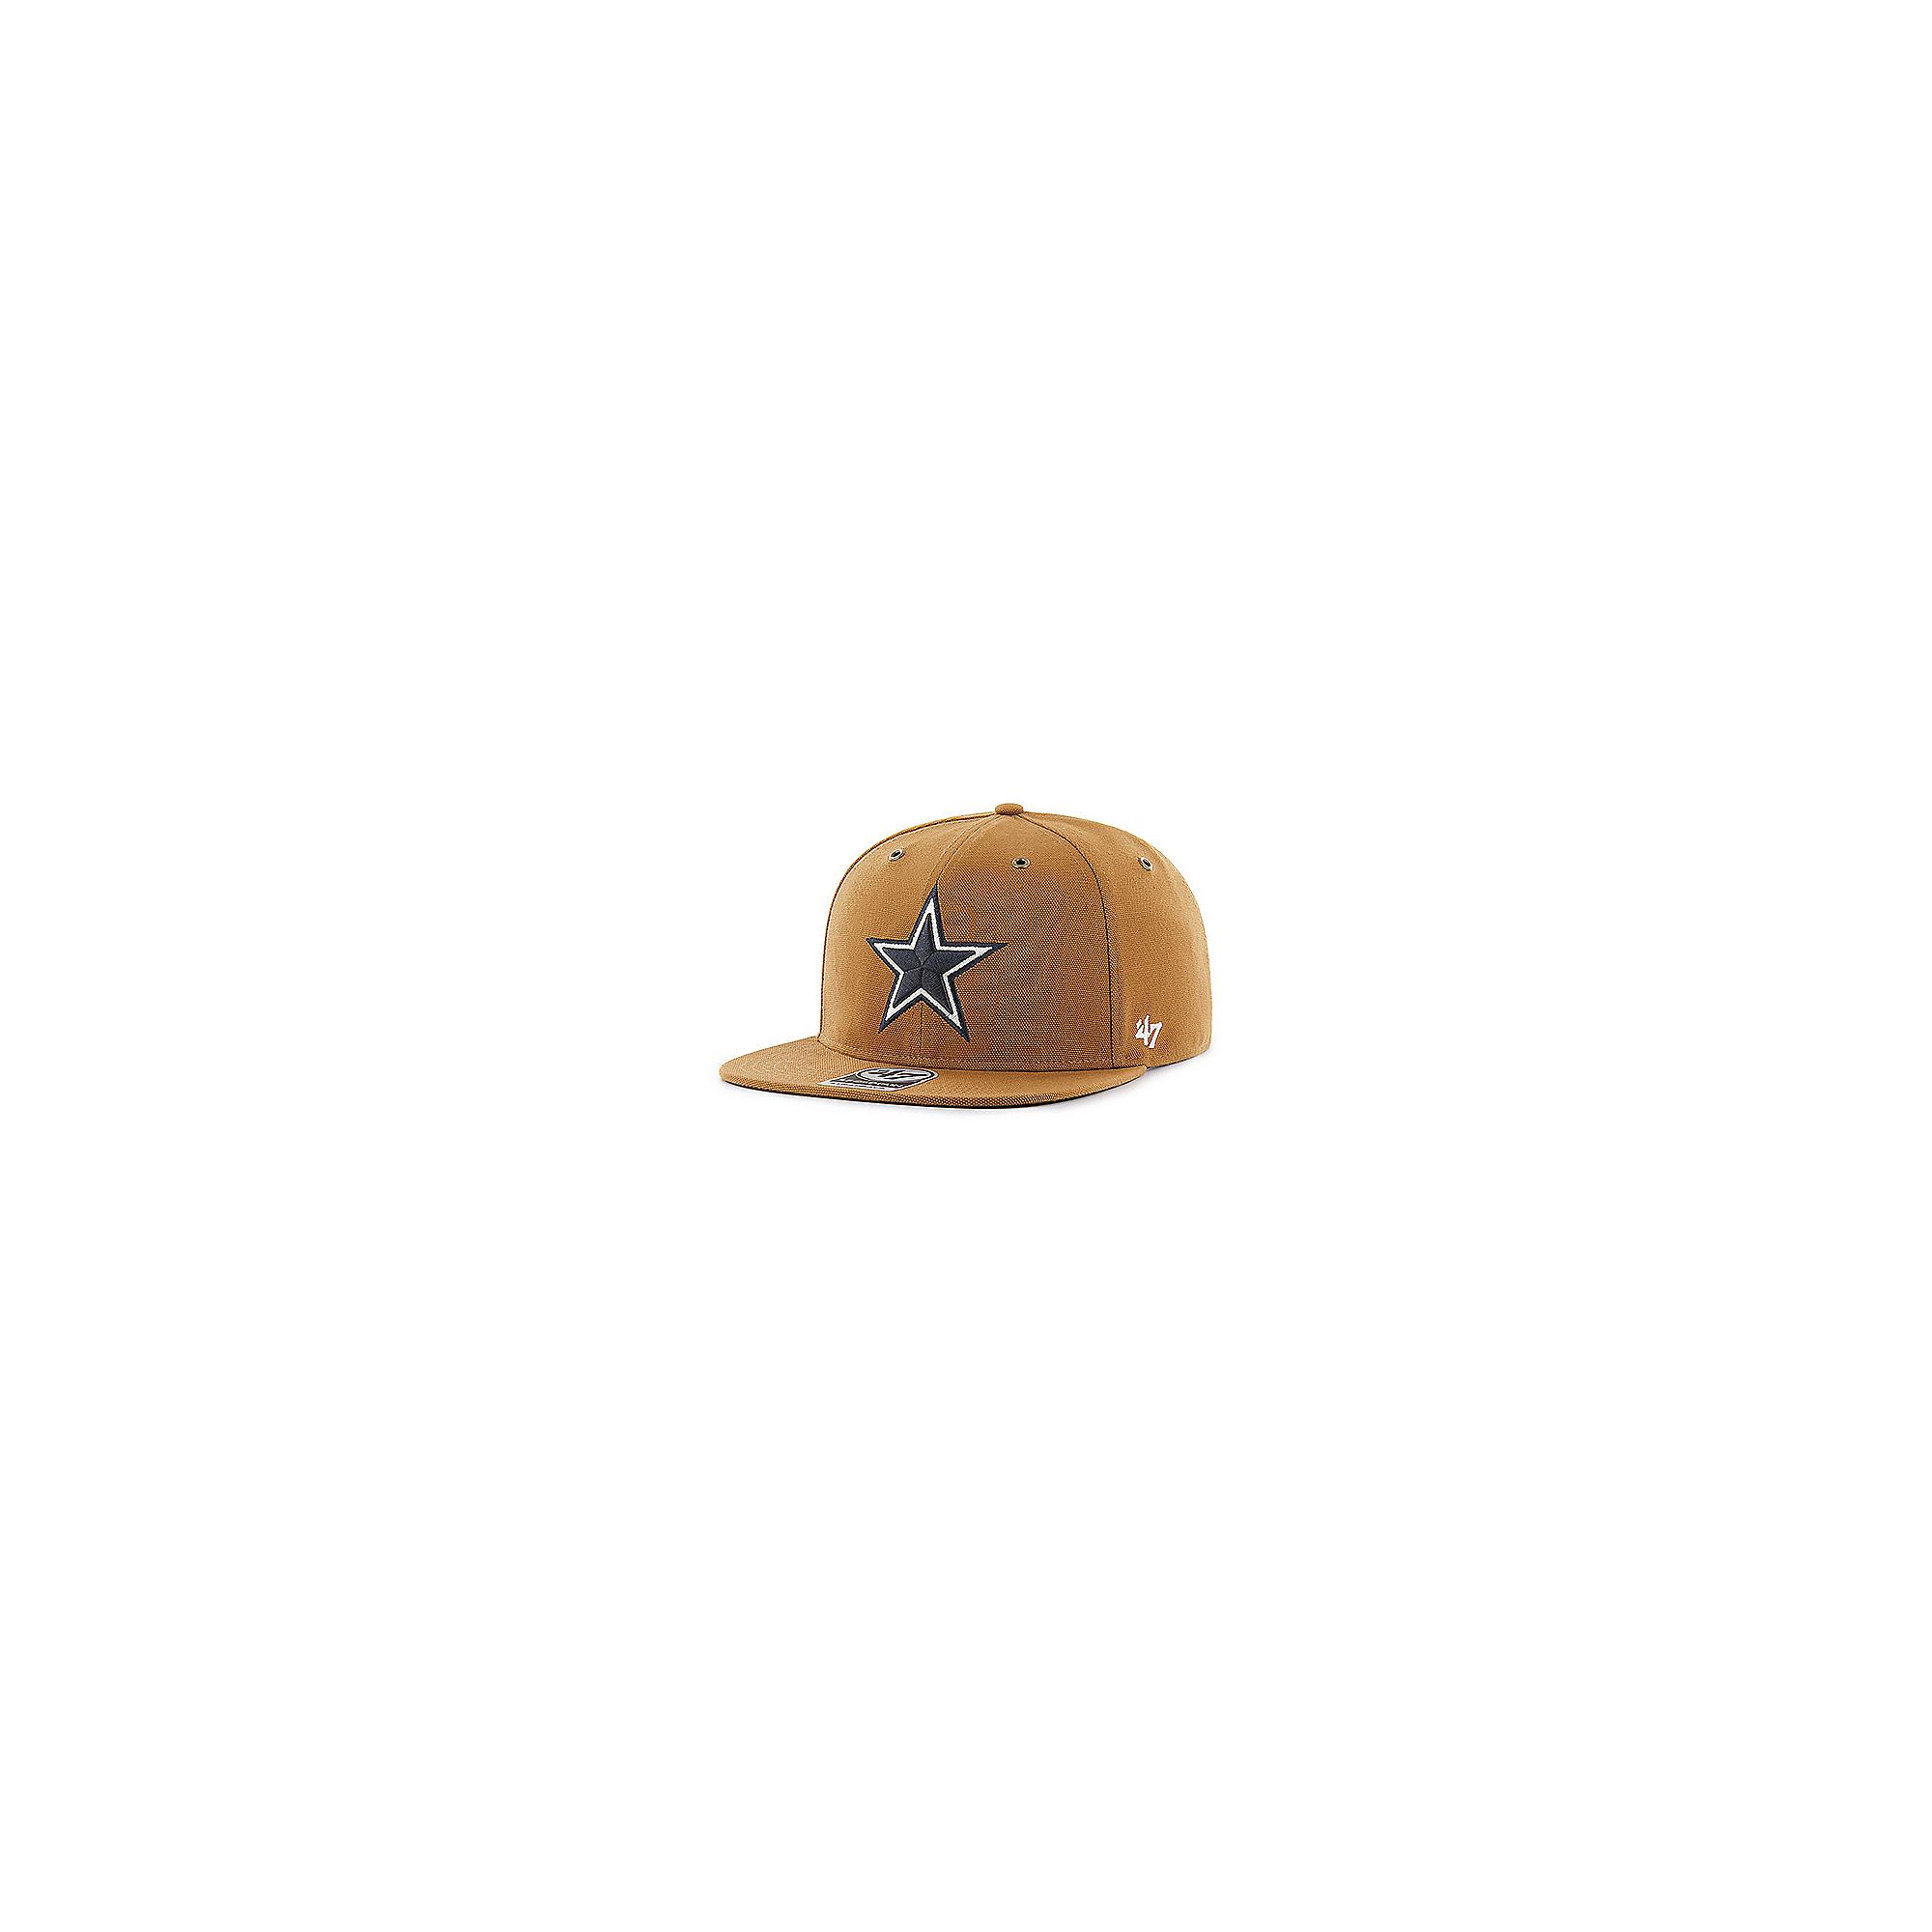 Dallas Cowboys Strap Carhartt x '47 Brand Captain Brown Adjustable Hat